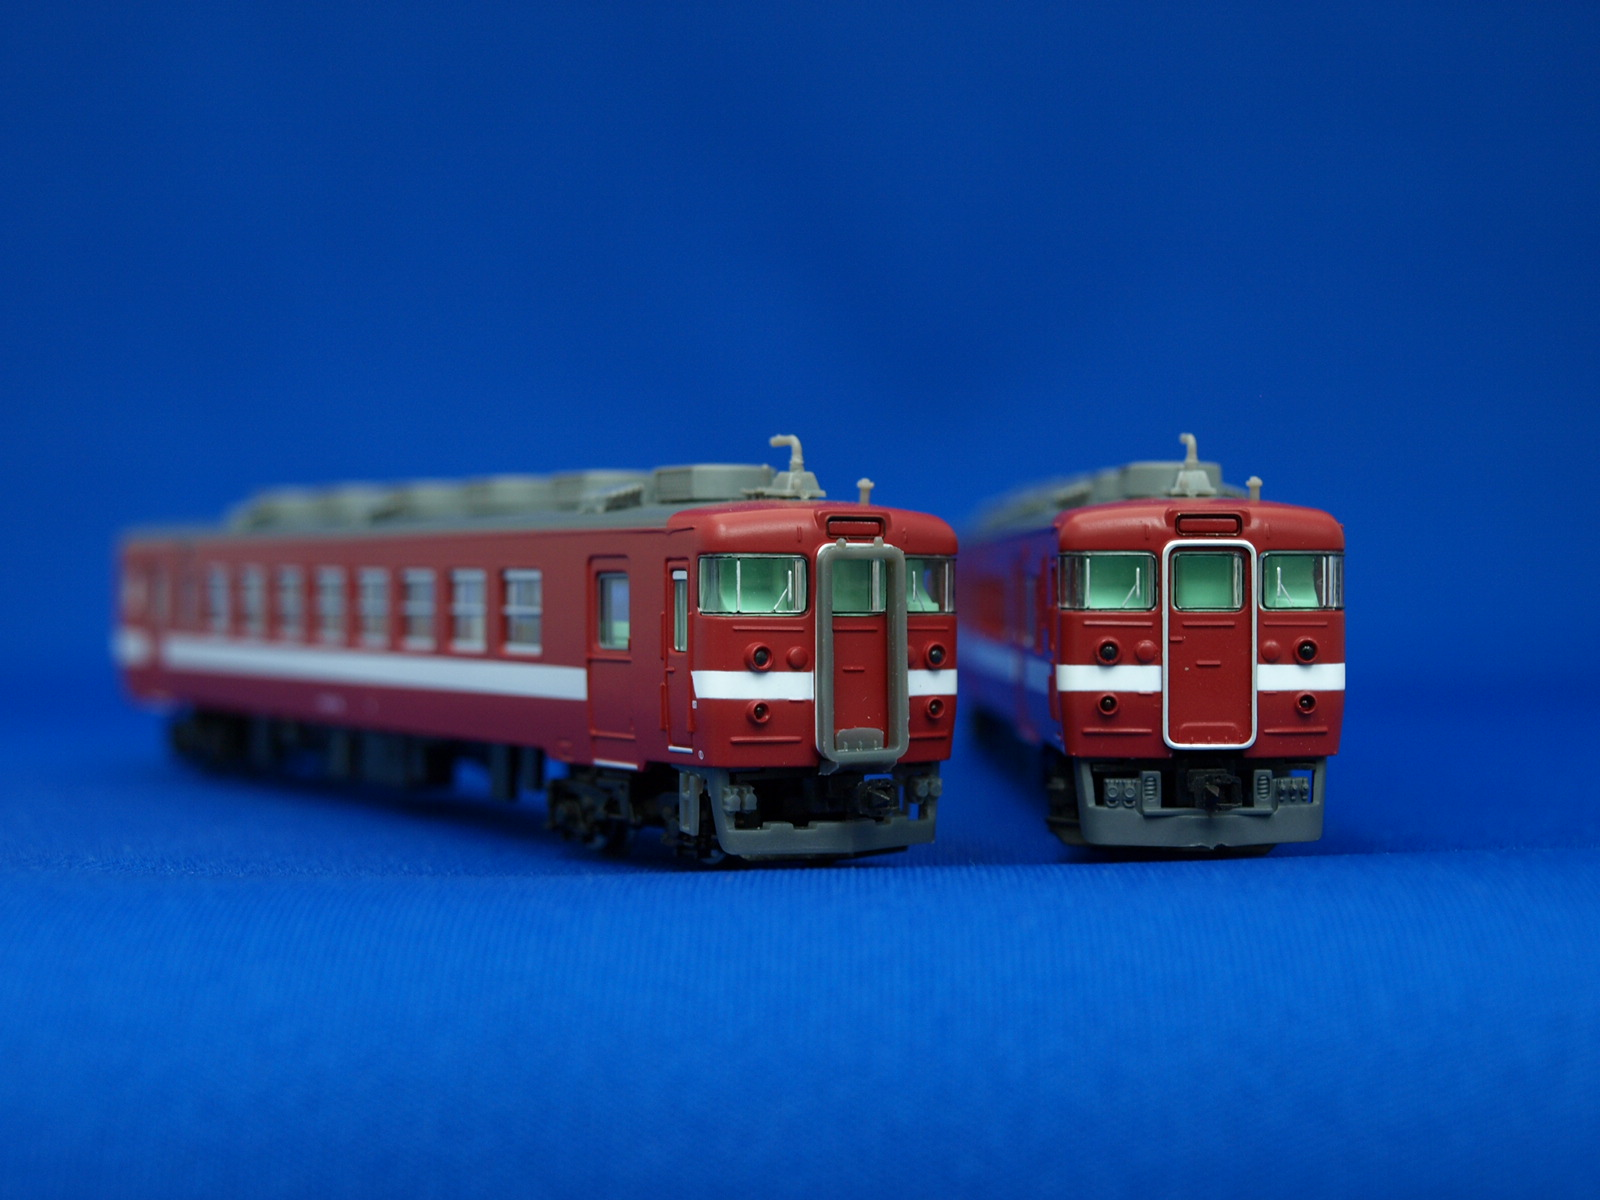 Nゲージ マイクロエース A0043 クハ455.702+413系旧北陸色3両セット